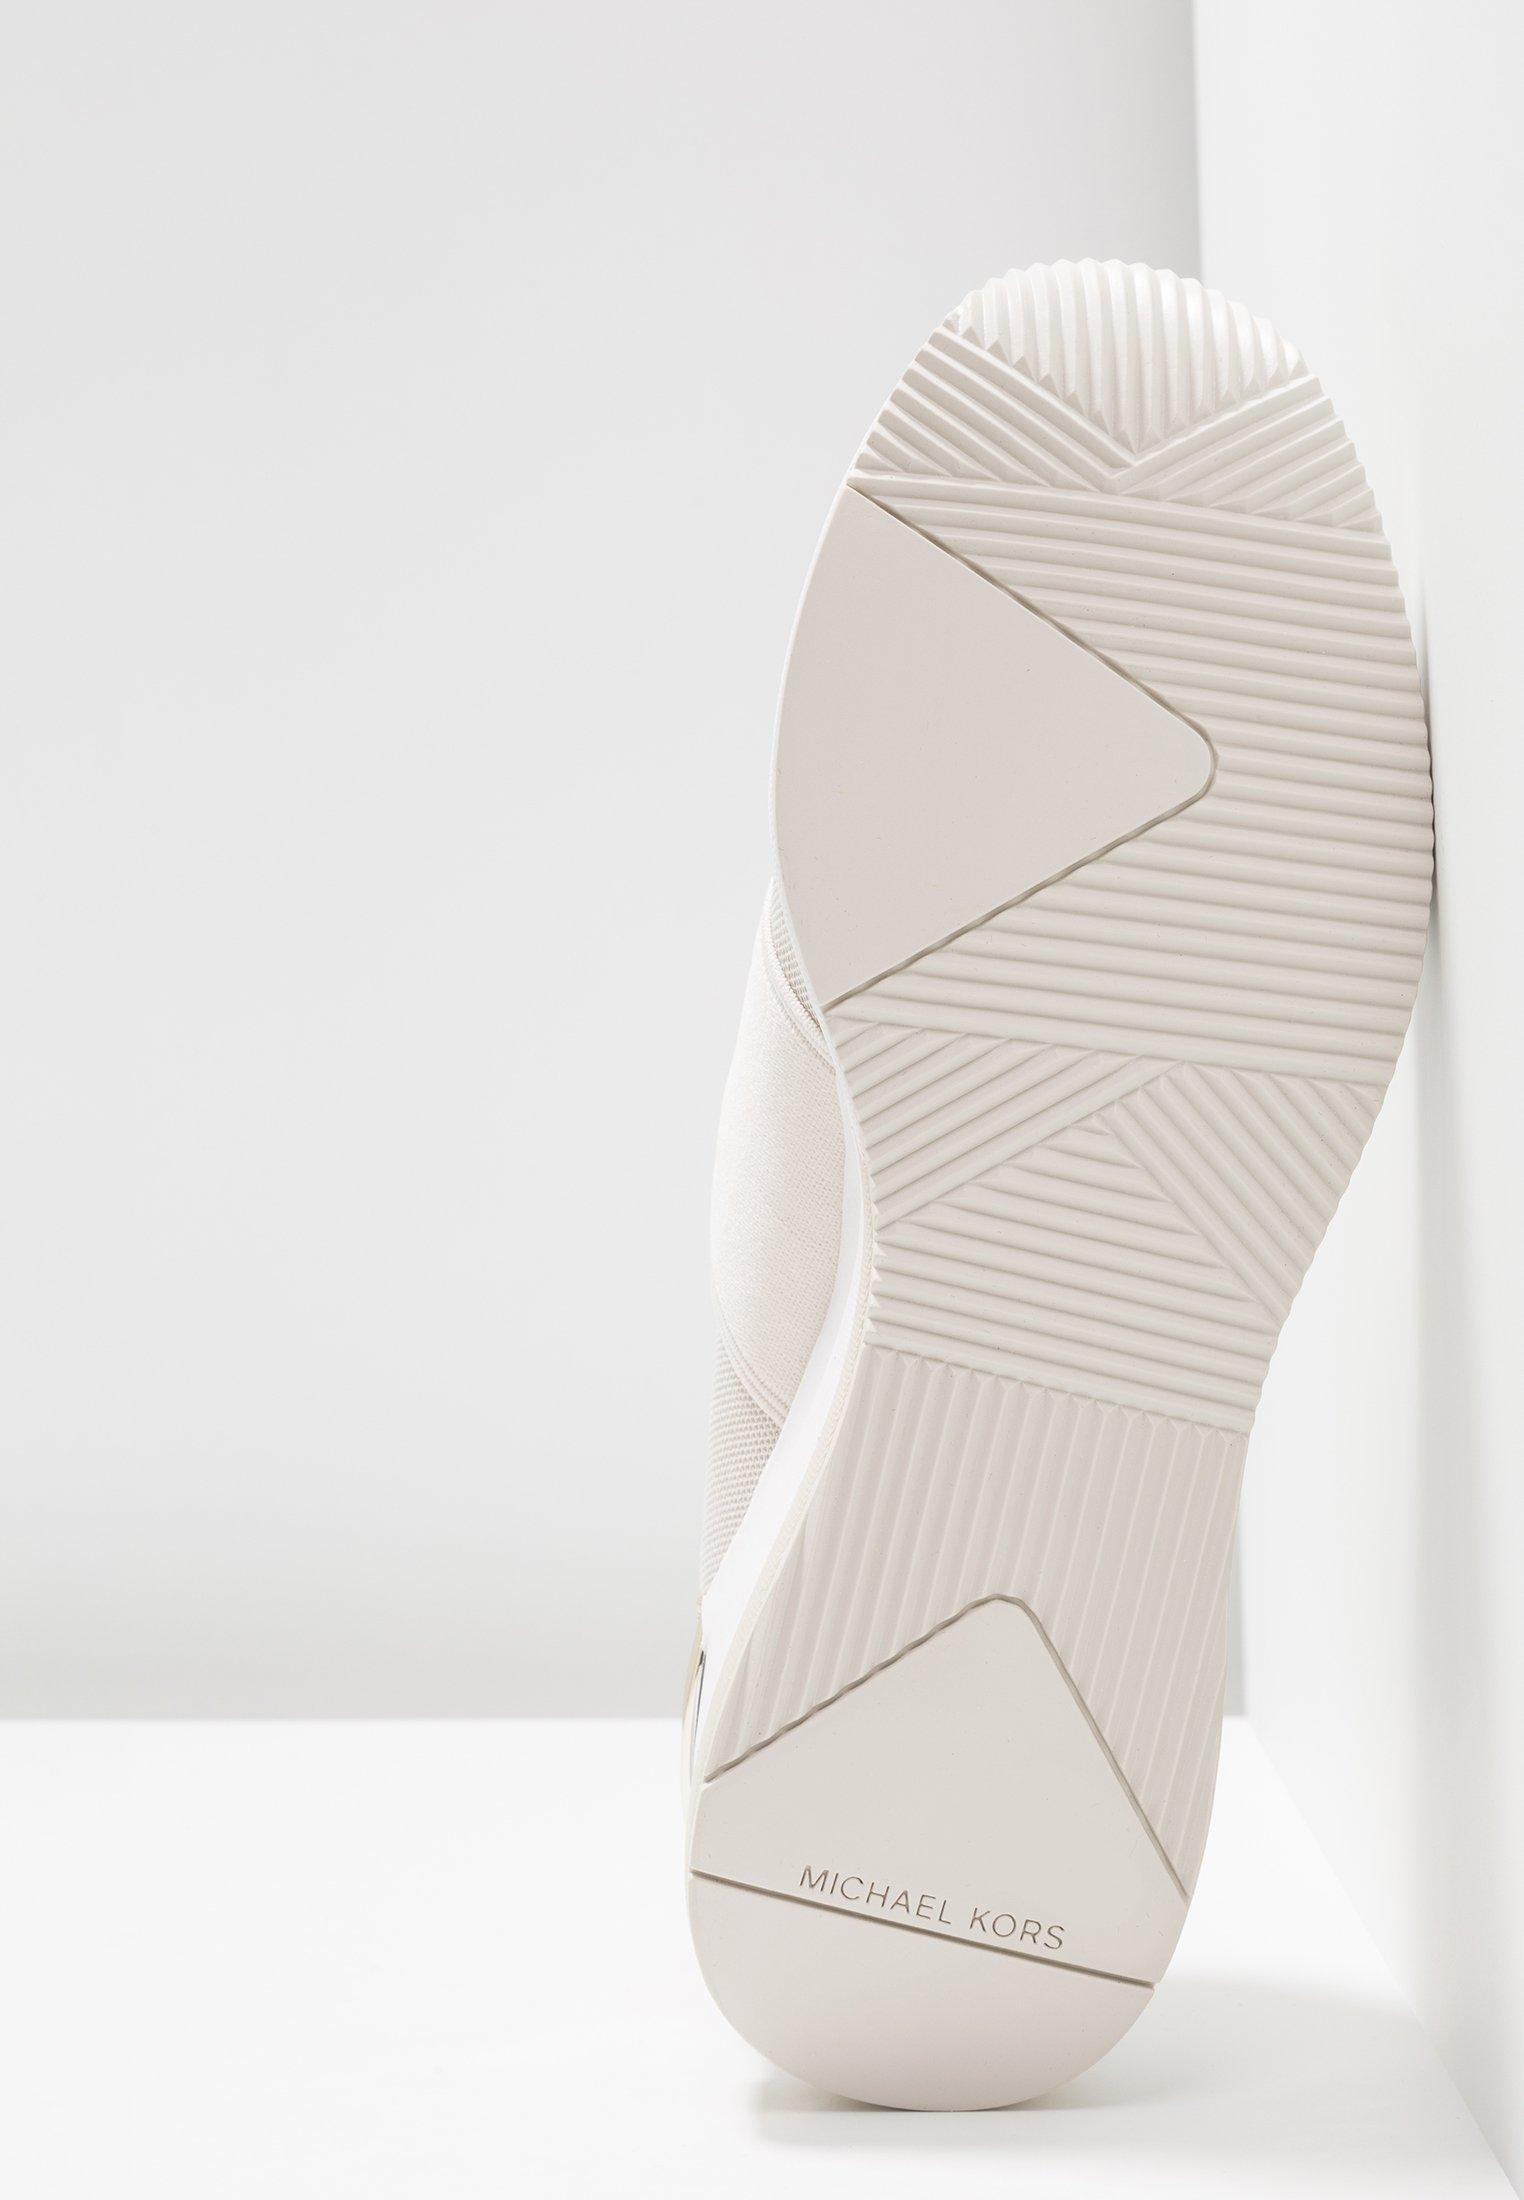 Michael Kors Felix Trainer - Sneakers Cream/pale Gold